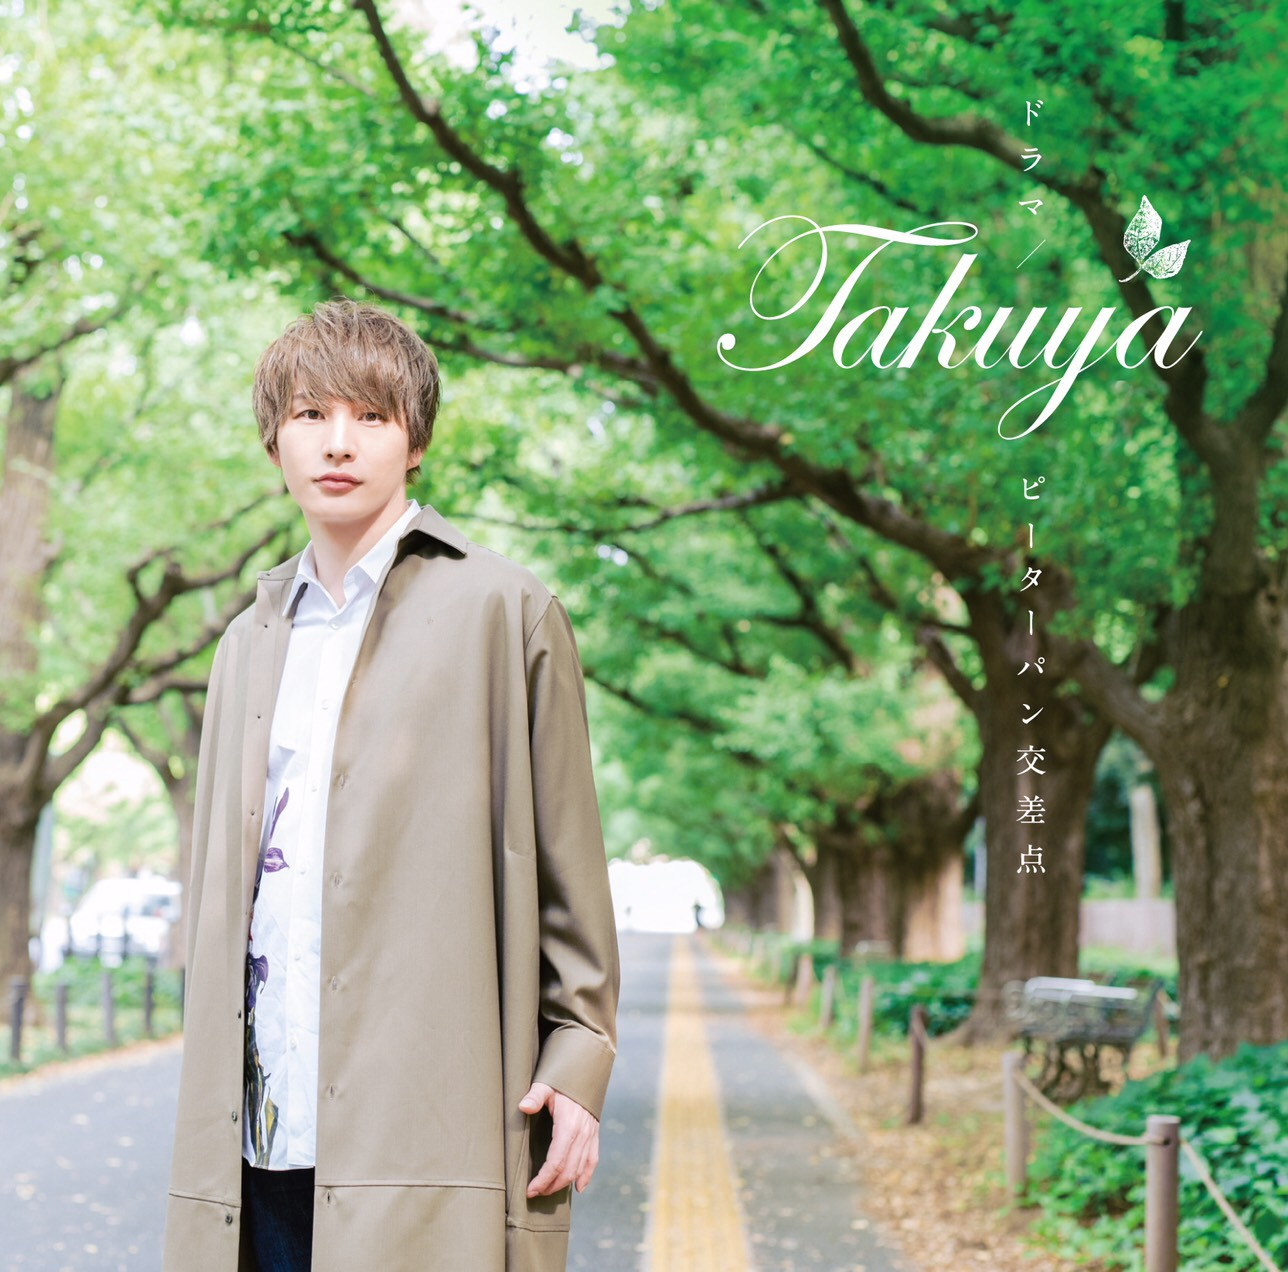 Takuya「ドラマ / ピーターパン交差点」TYPE-A